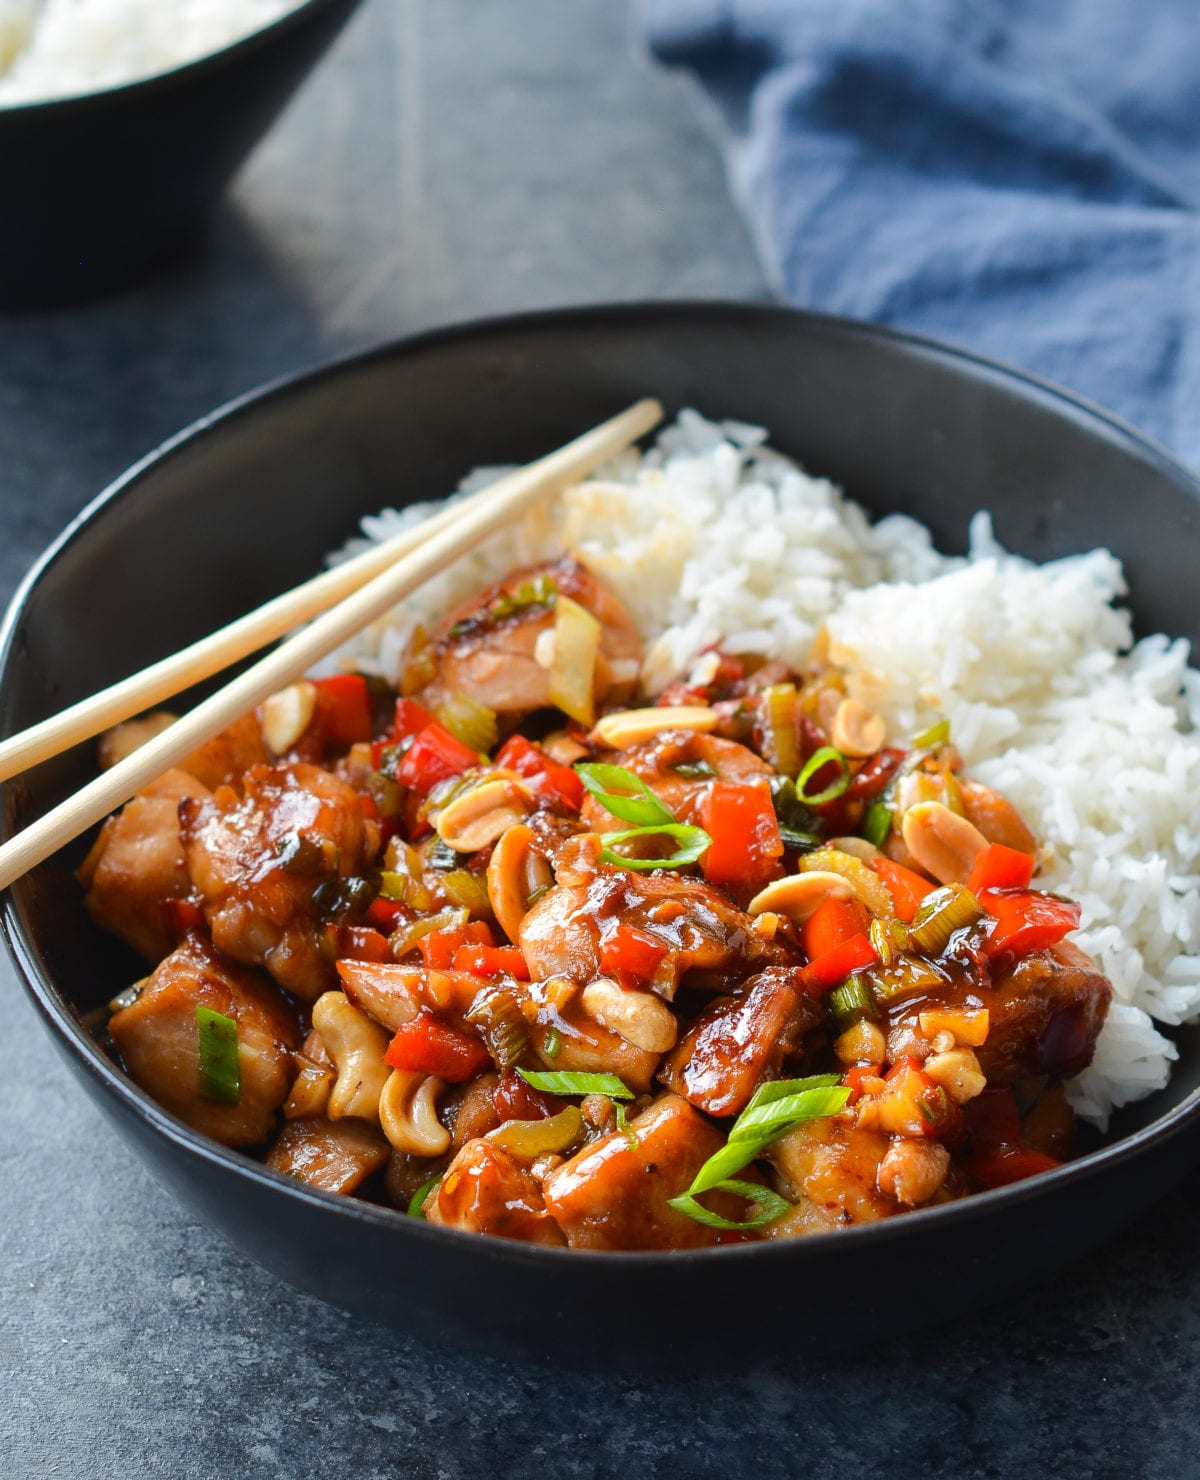 Tasty Kung Pao Chicken